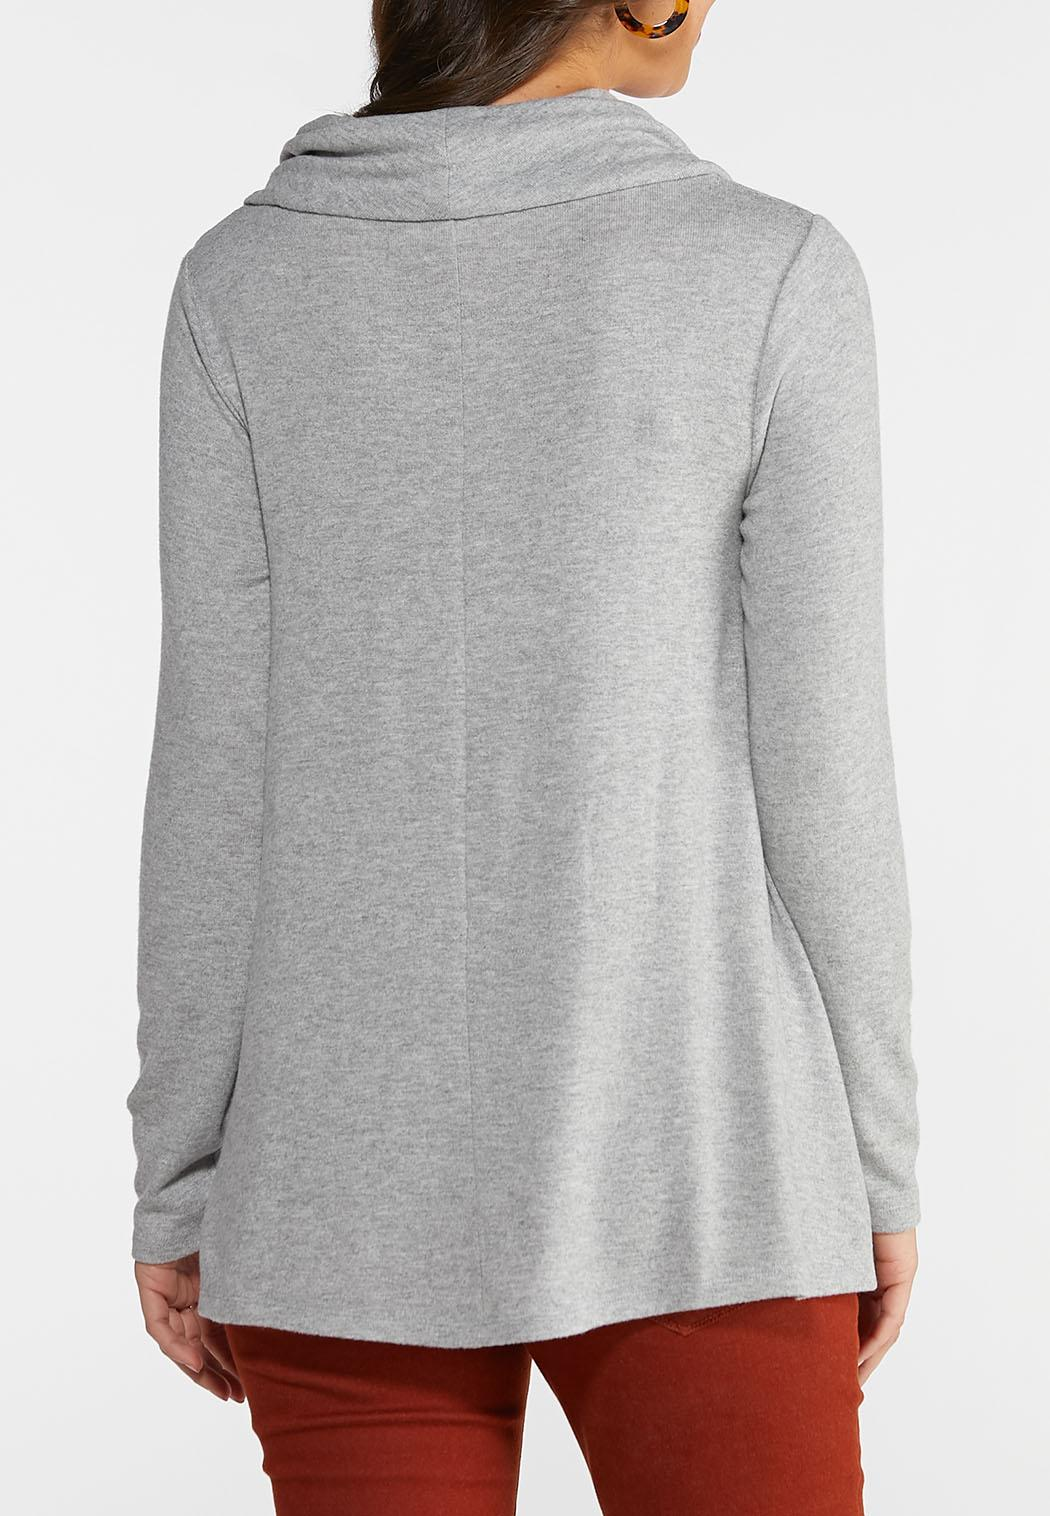 Plus Size Cowl Neck Tunic Top (Item #44015103)